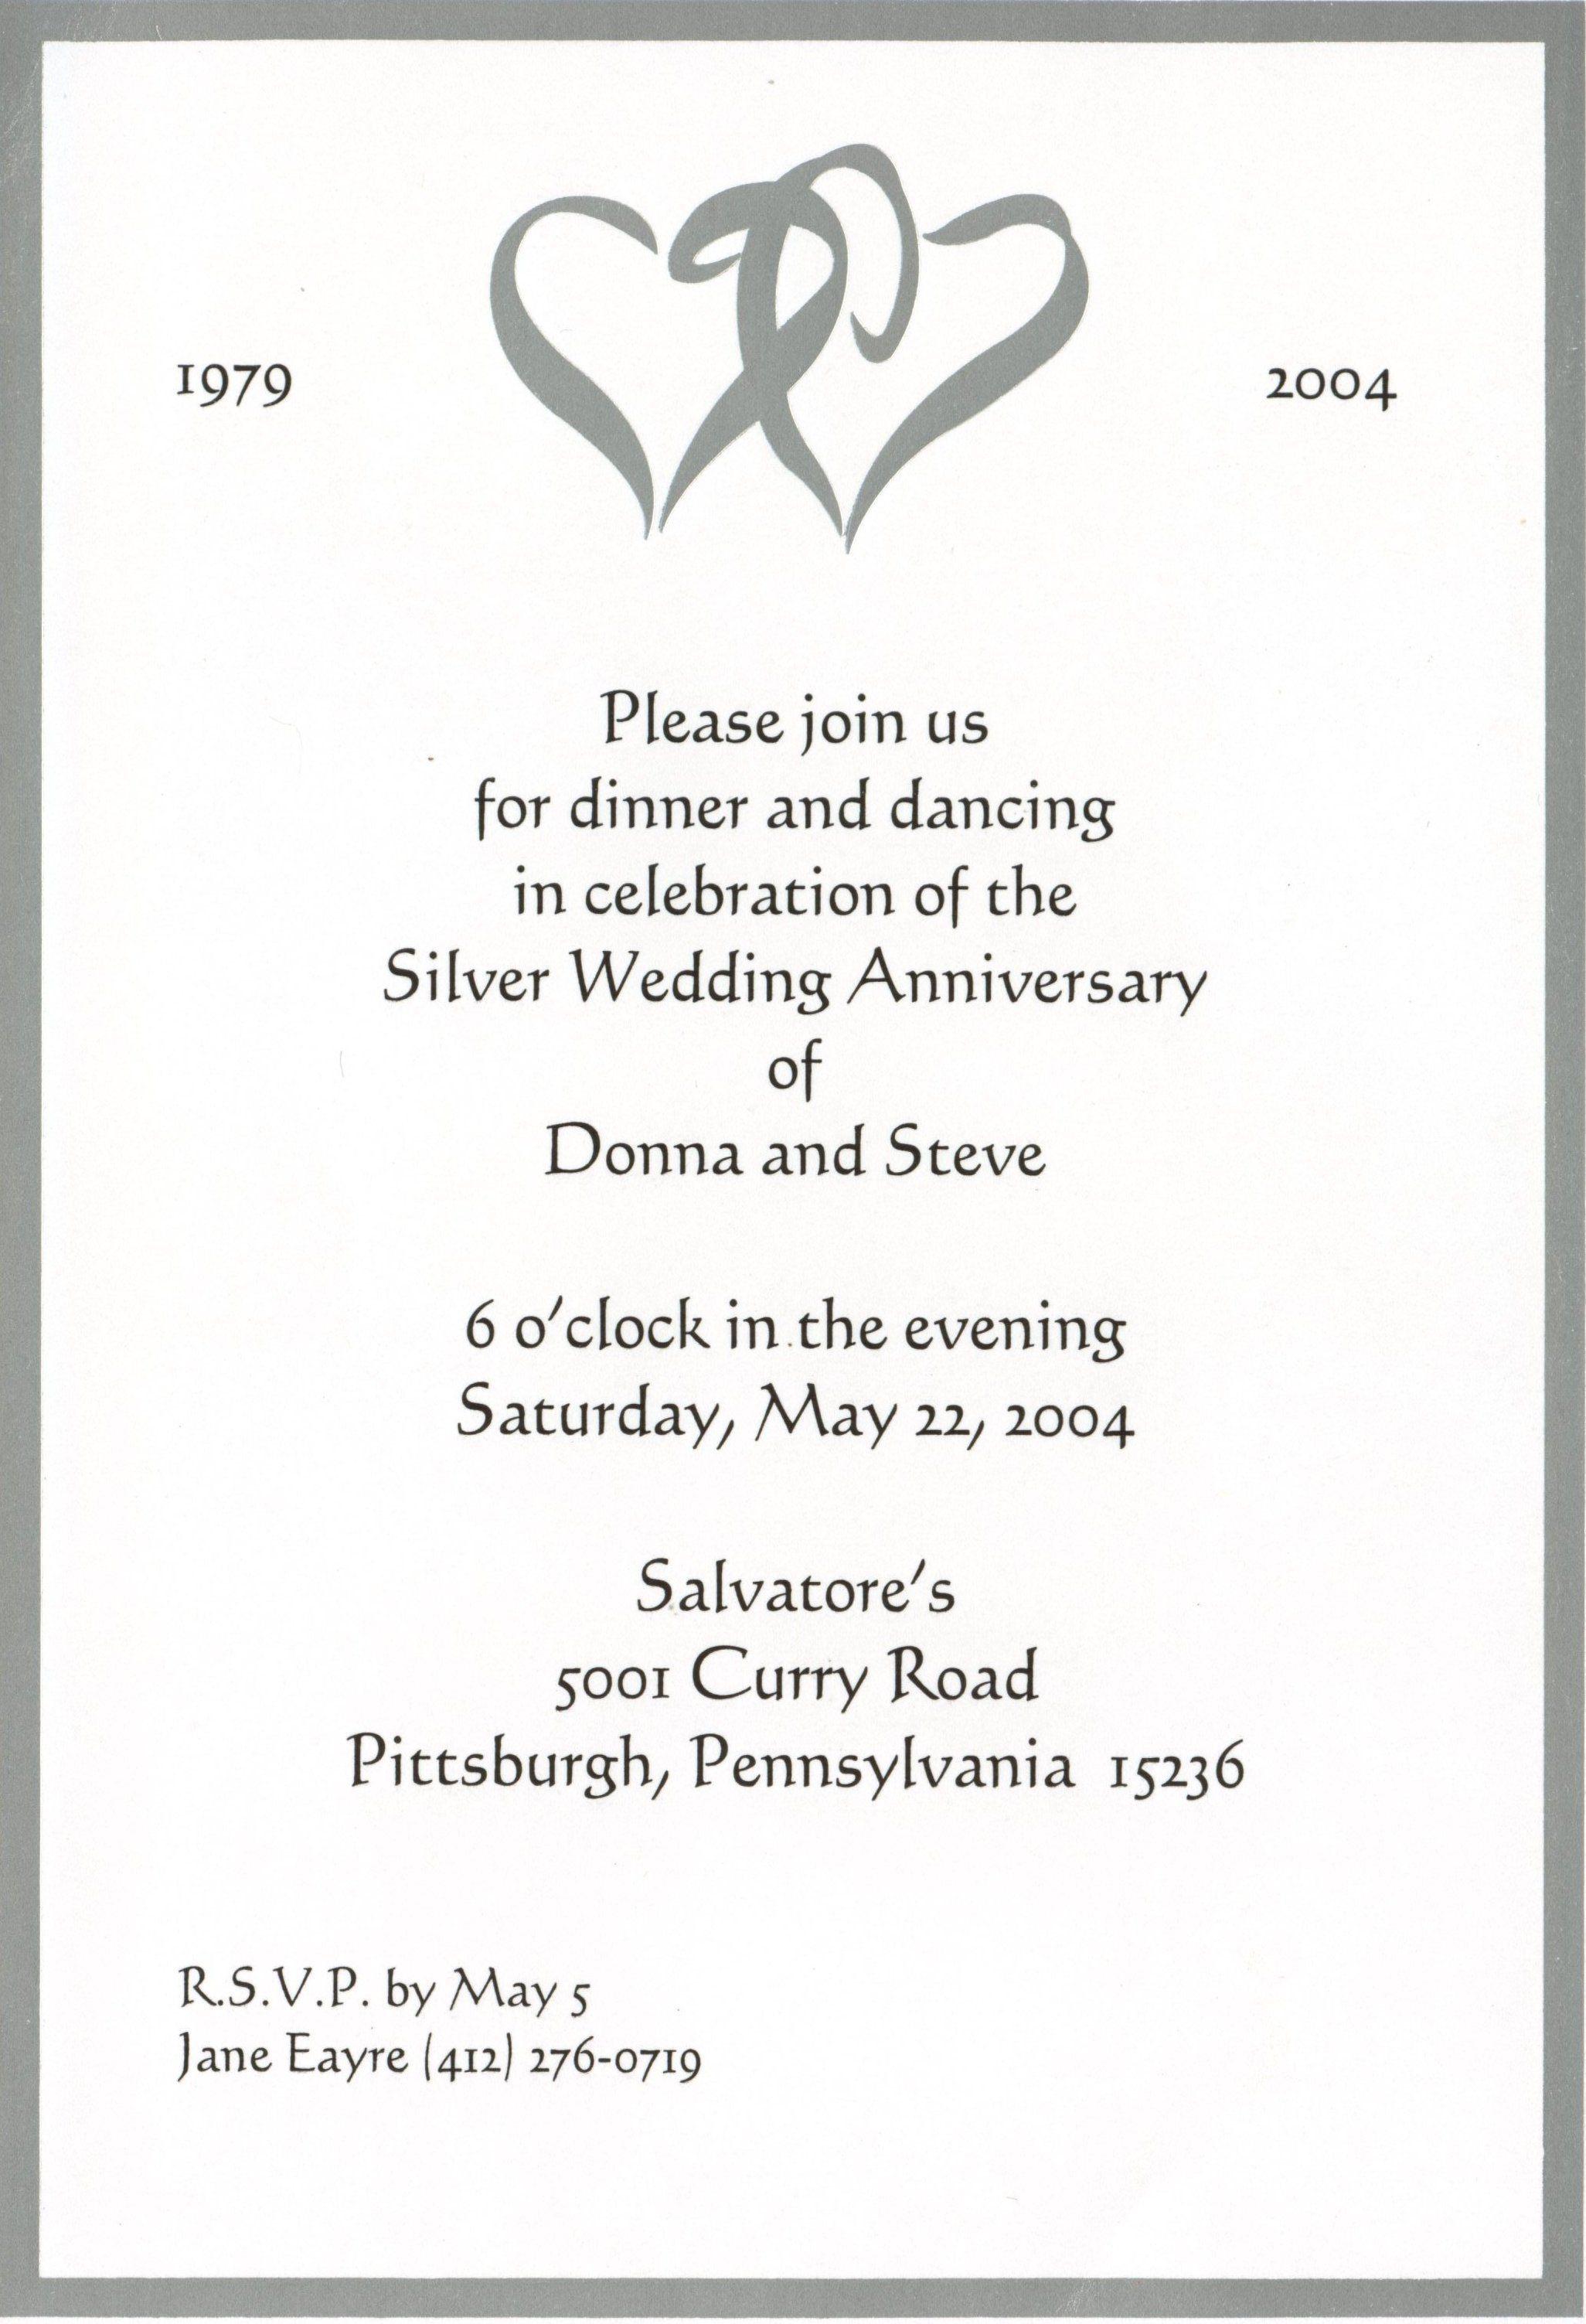 001 Sensational 50th Wedding Anniversary Invitation Card Template Idea  Templates SampleFull